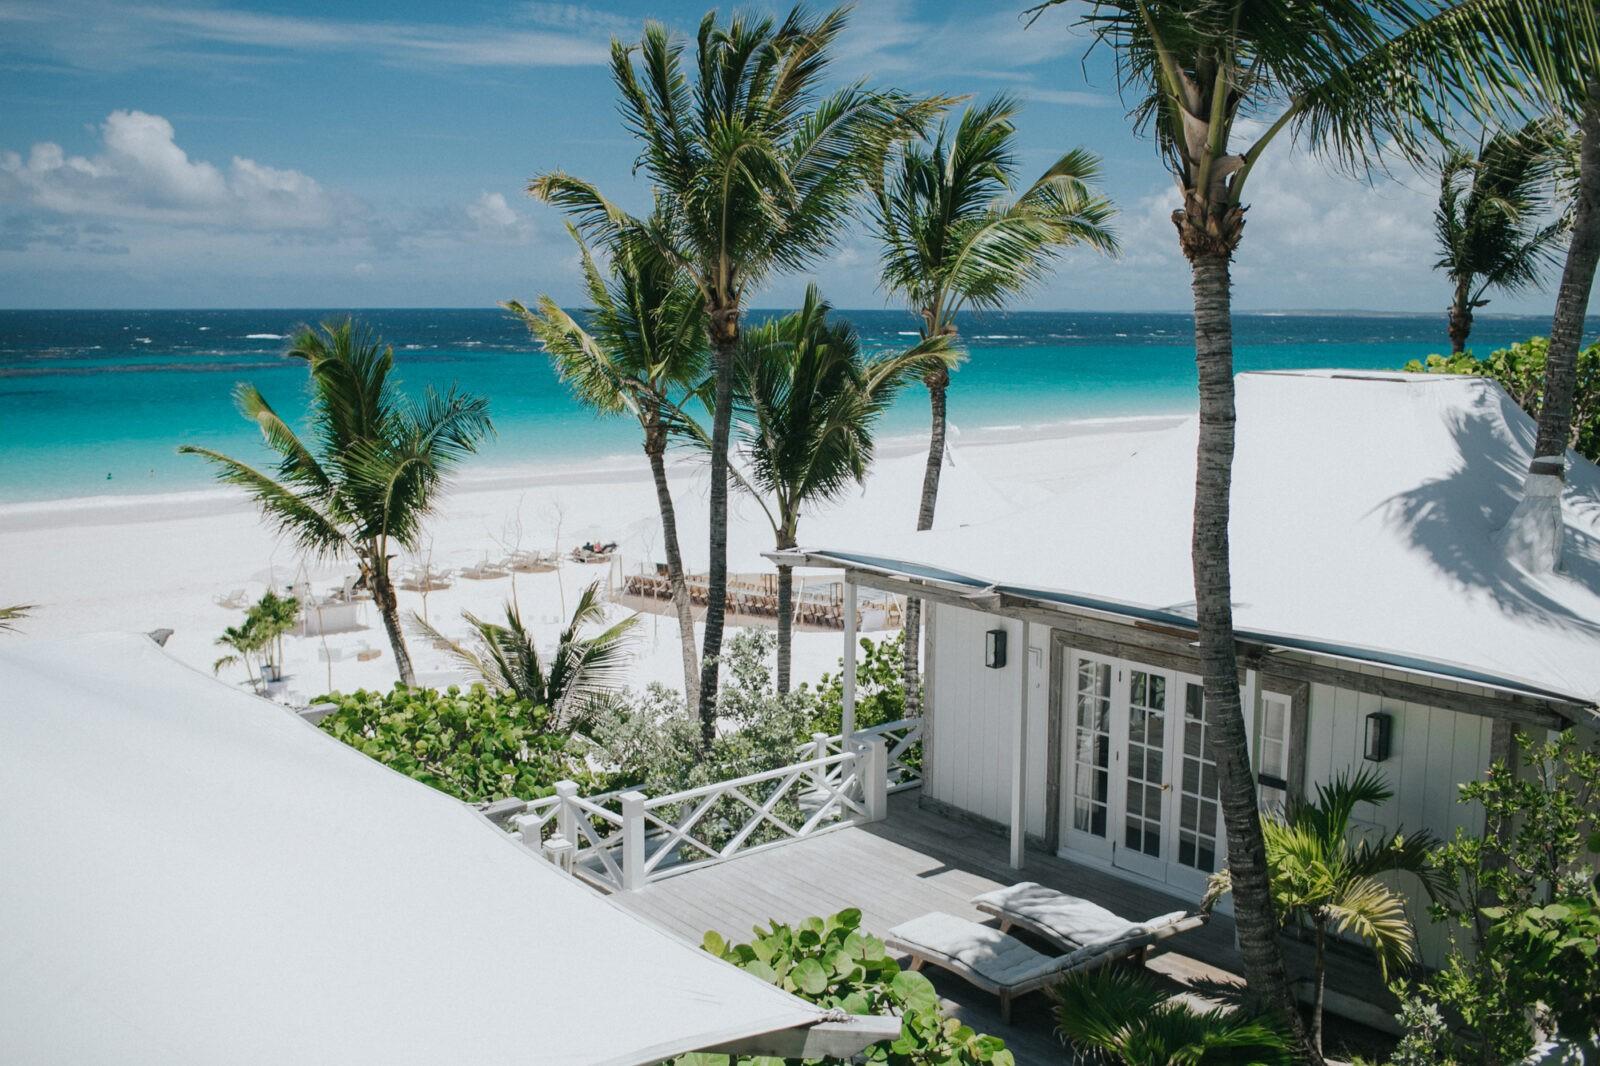 ocean view club bahamas